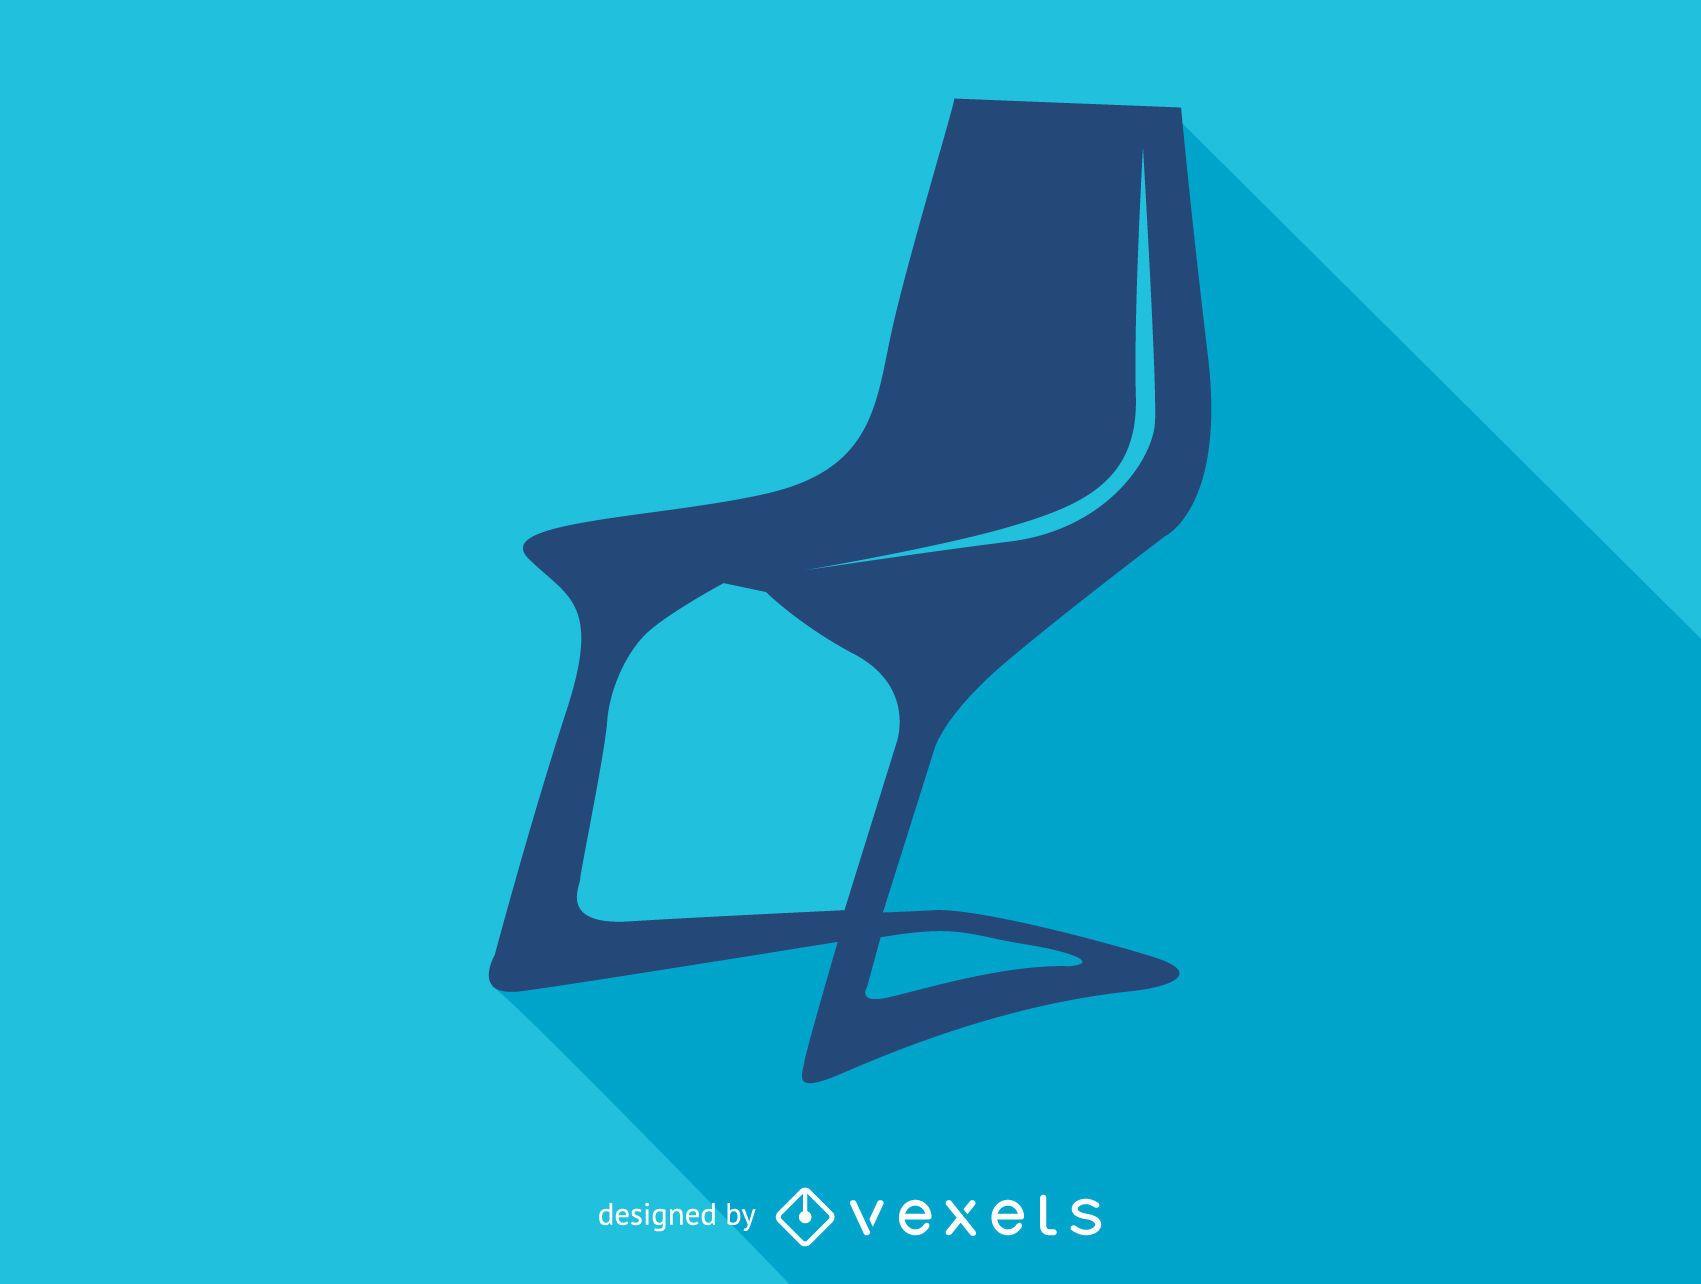 Icono de silueta de silla myto